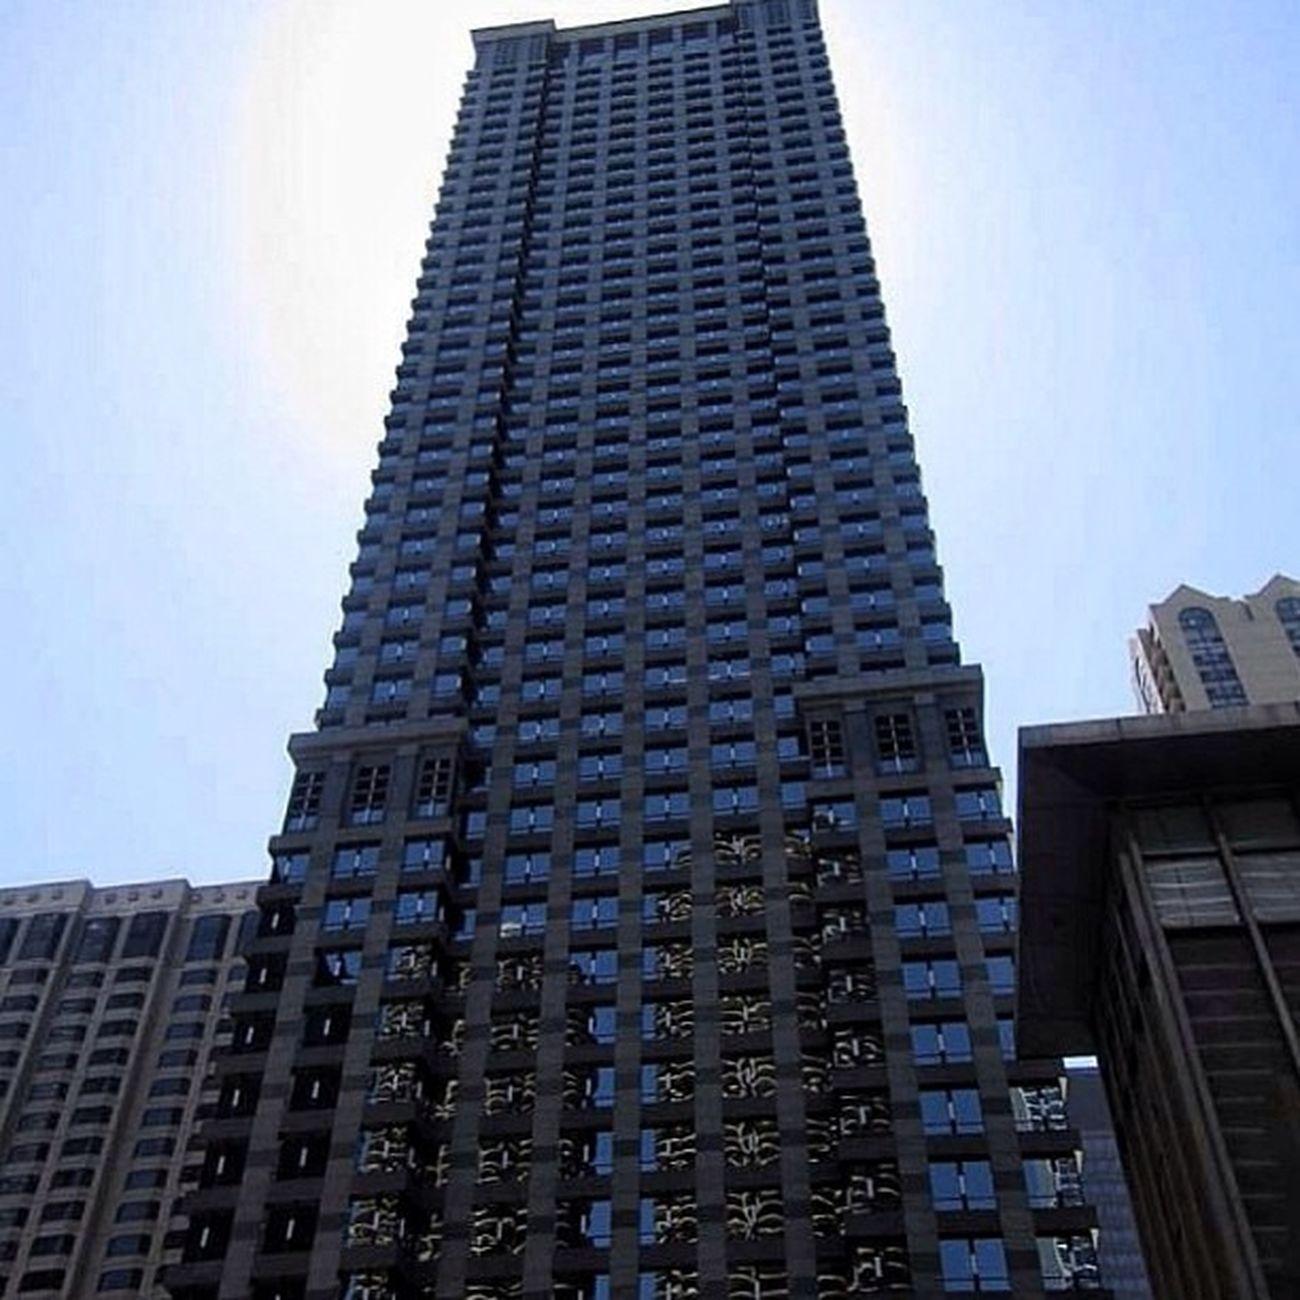 Chicago #chicago #city #street #skyscraper #house #honktravel #usa Street City Chicago House USA Skyscraper Honktravel